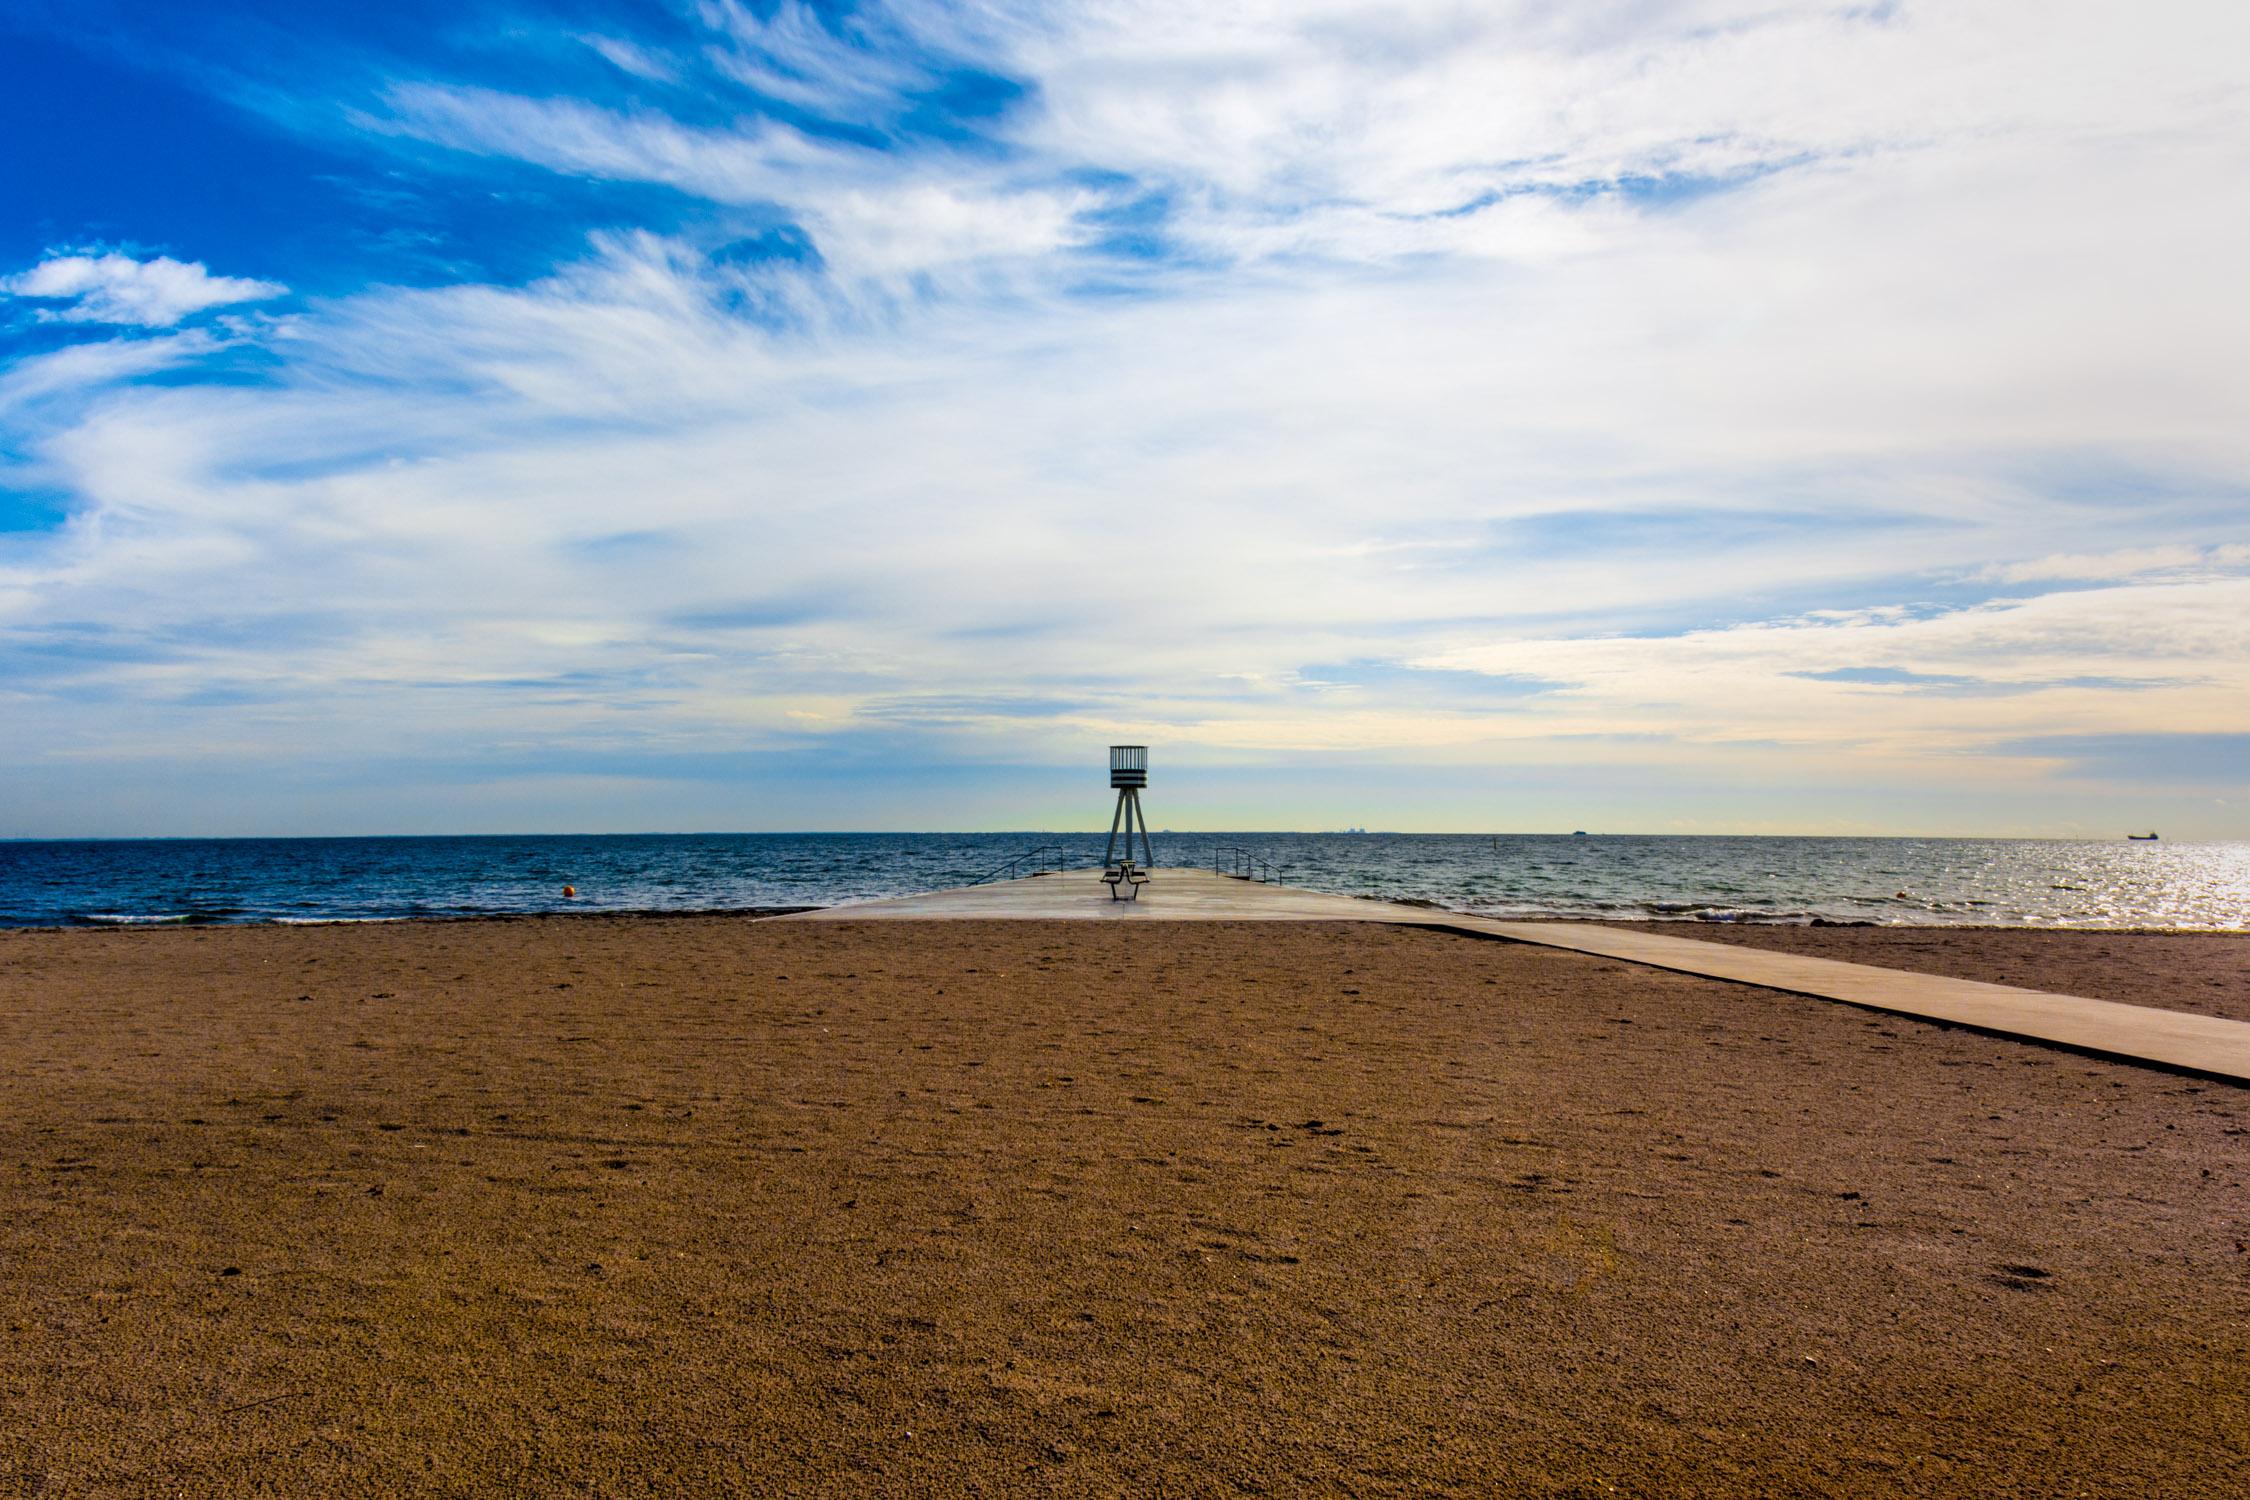 Walking along the beach near Skovshoved Hotel